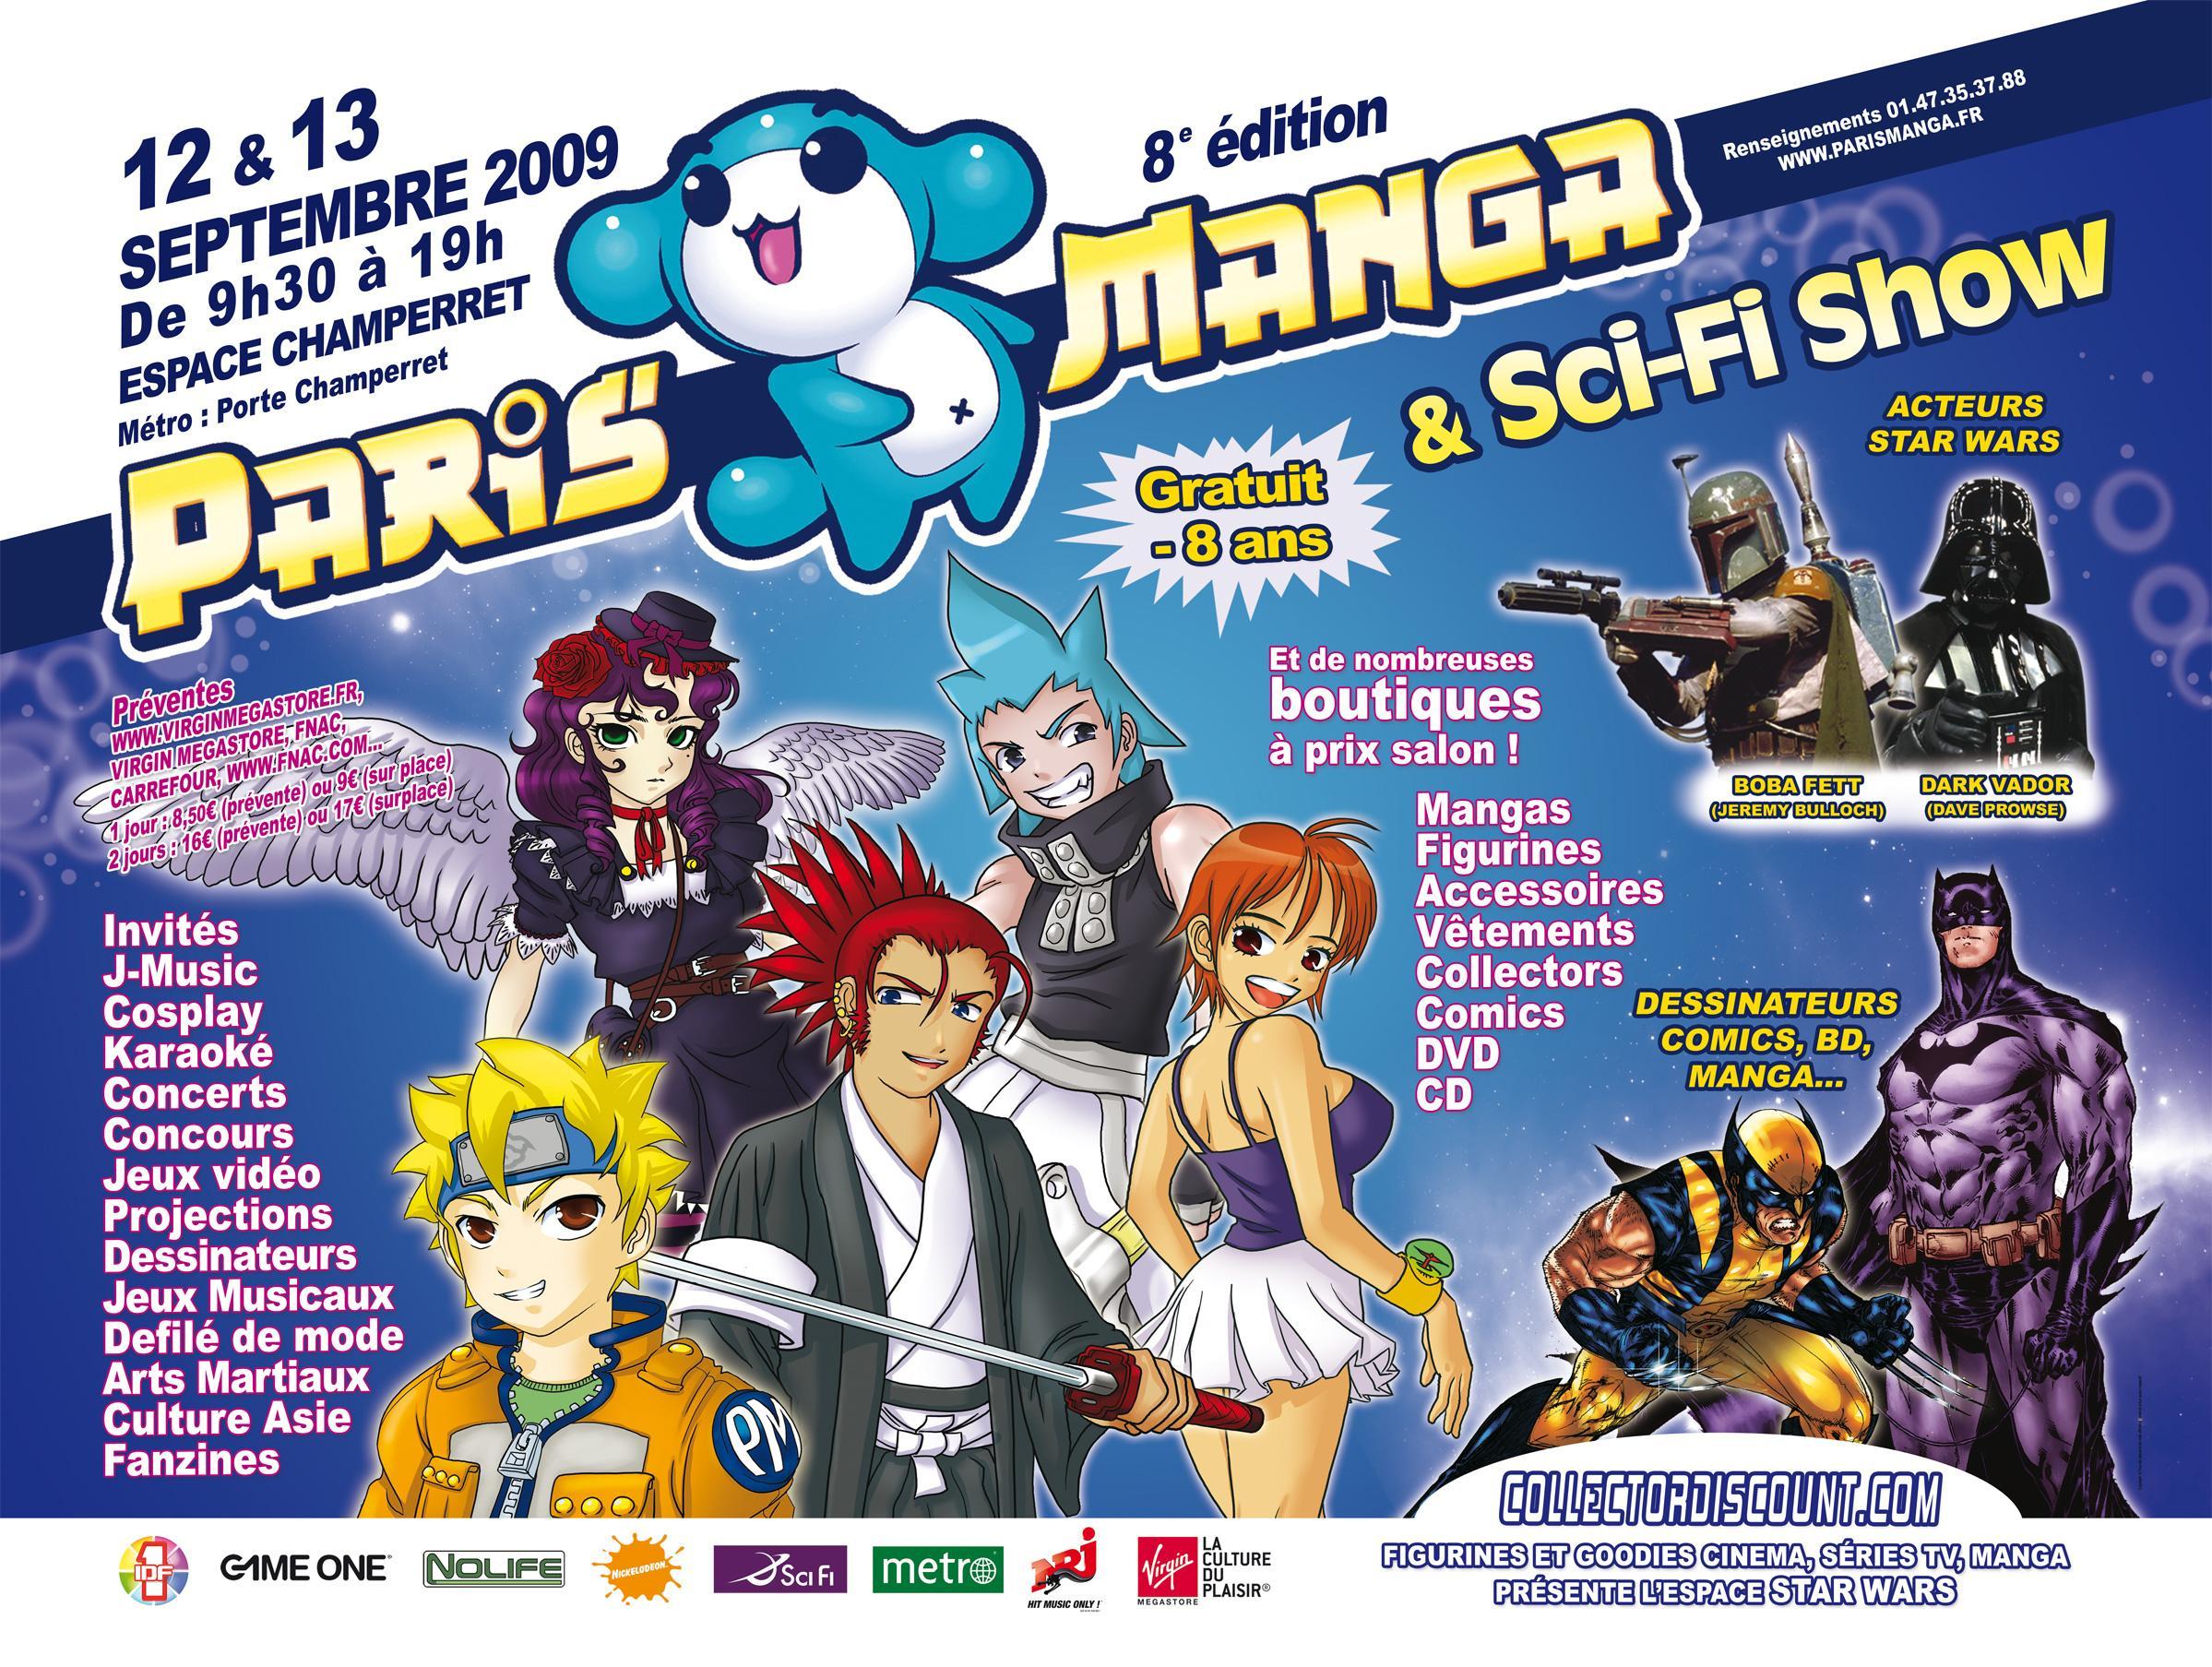 Salon paris manga 12 et 13 septembre 2009 espace for Salon manga paris